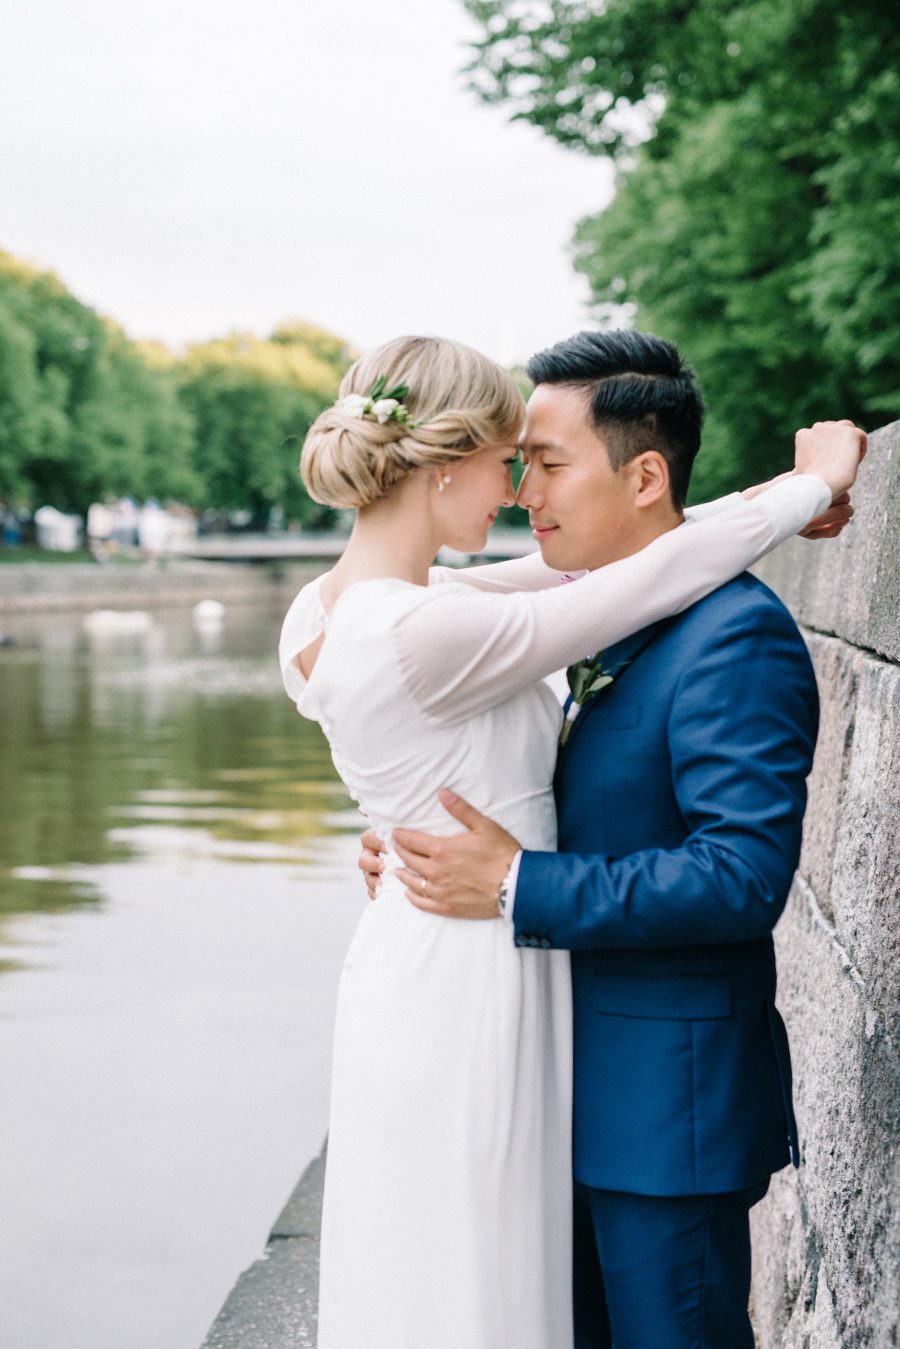 Justina & Lee, Chinese-Lithuanian wedding at Restaurant Tårget, Turku